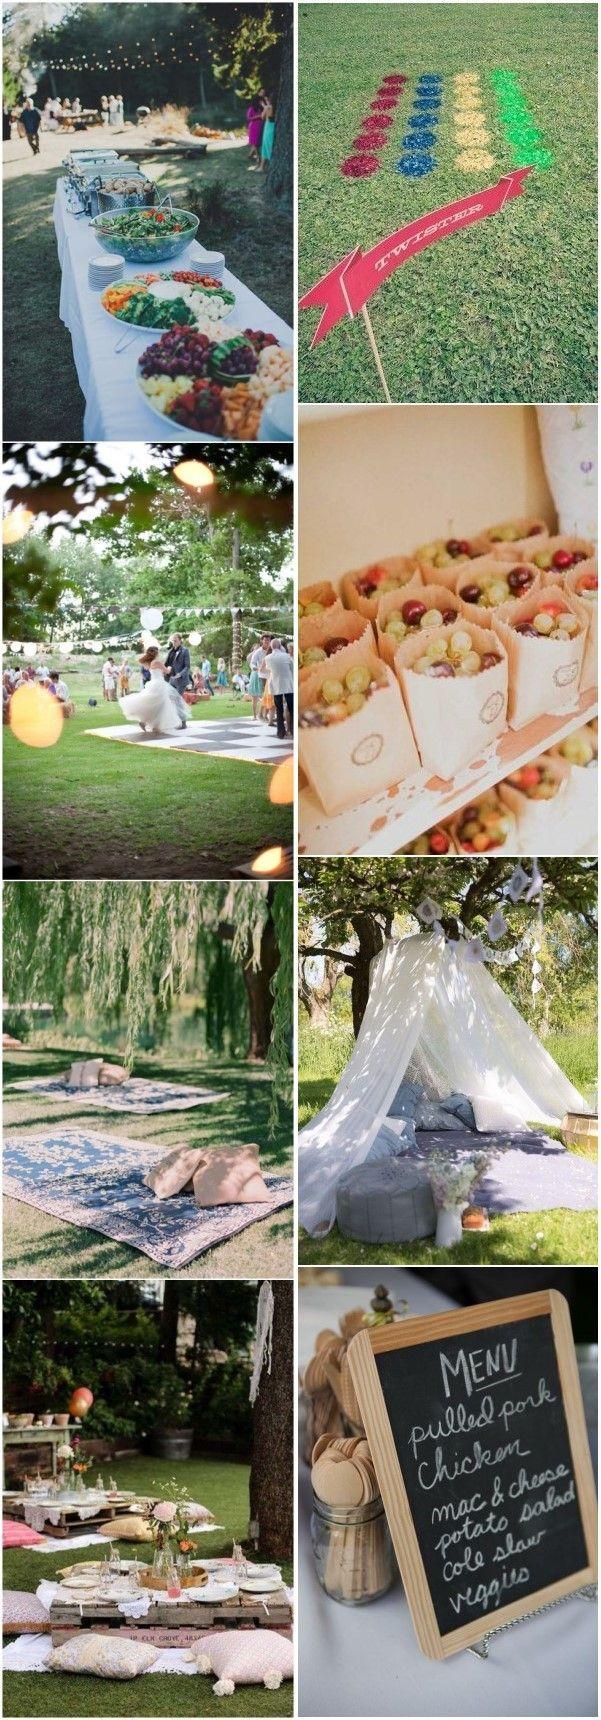 18 Budget Friendly Picnic Wedding Reception Ideas Picnic Wedding